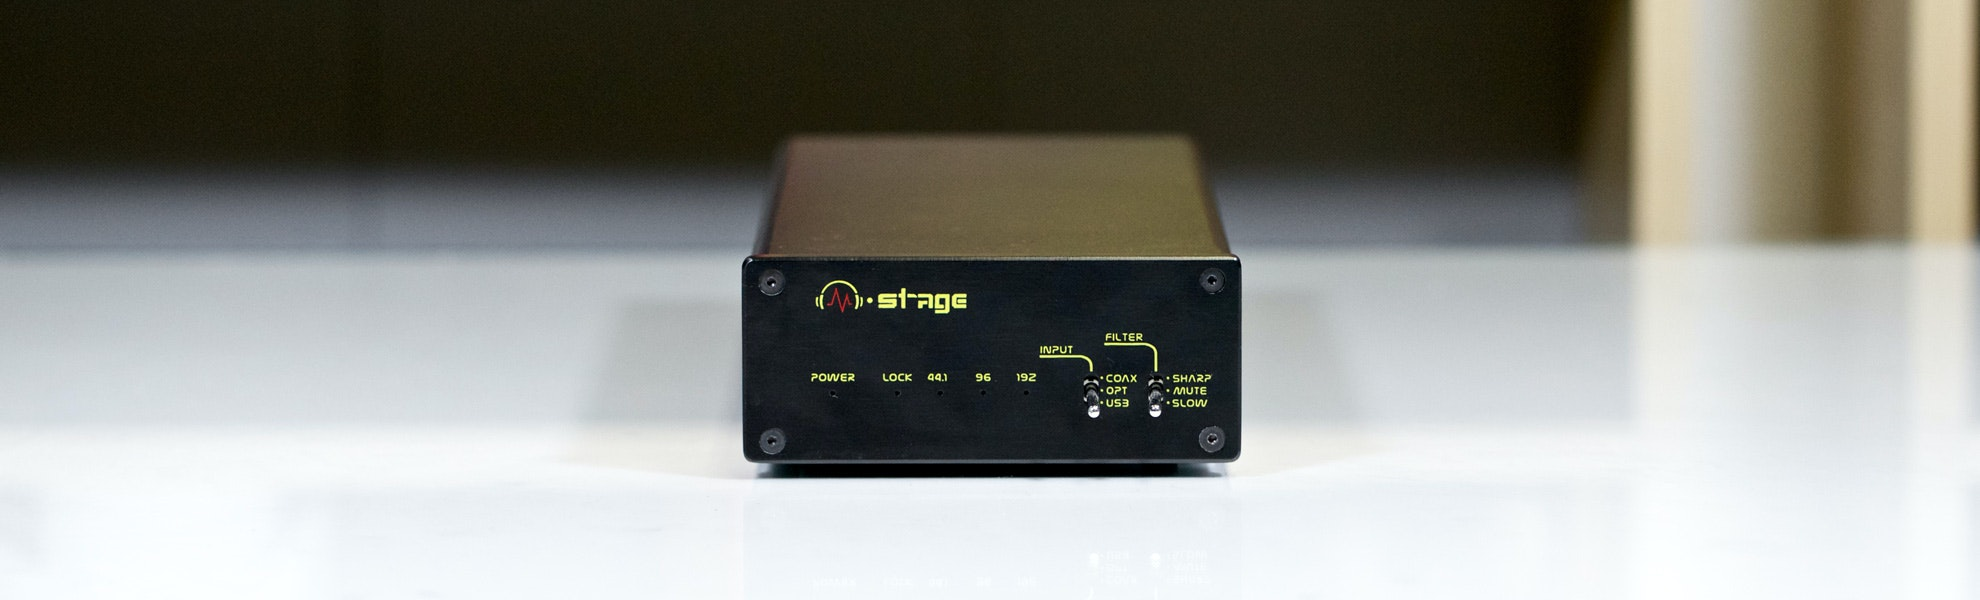 Matrix M-Stage DAC Audio Source